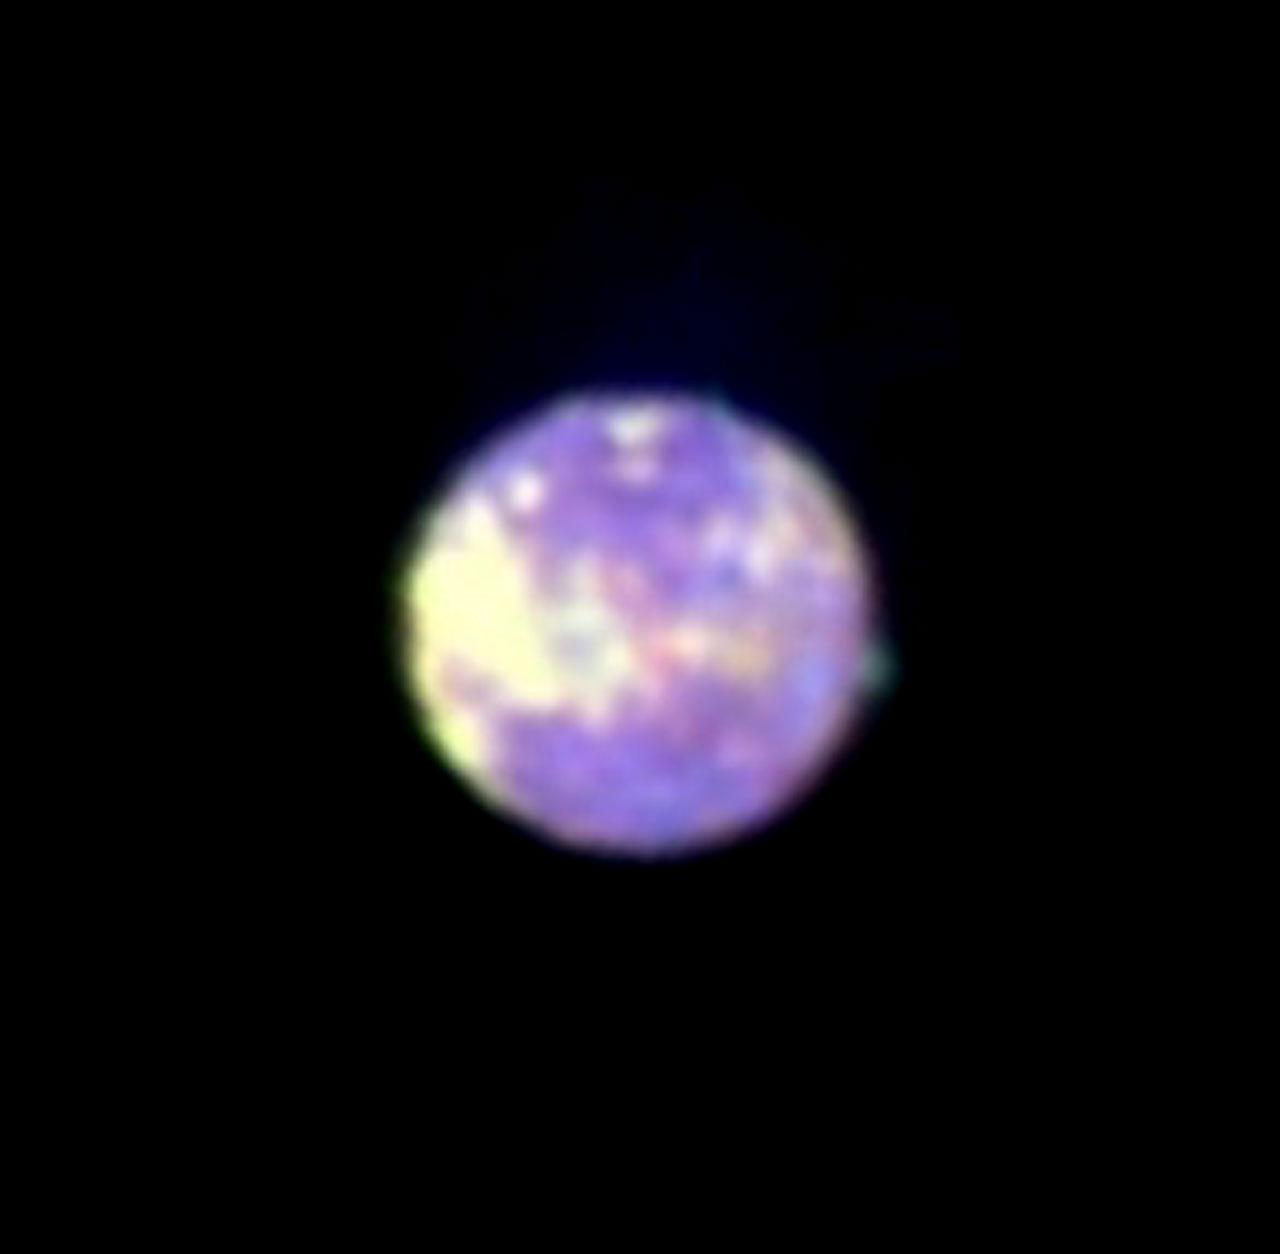 jupiter u0026 39 s volcanic moon io